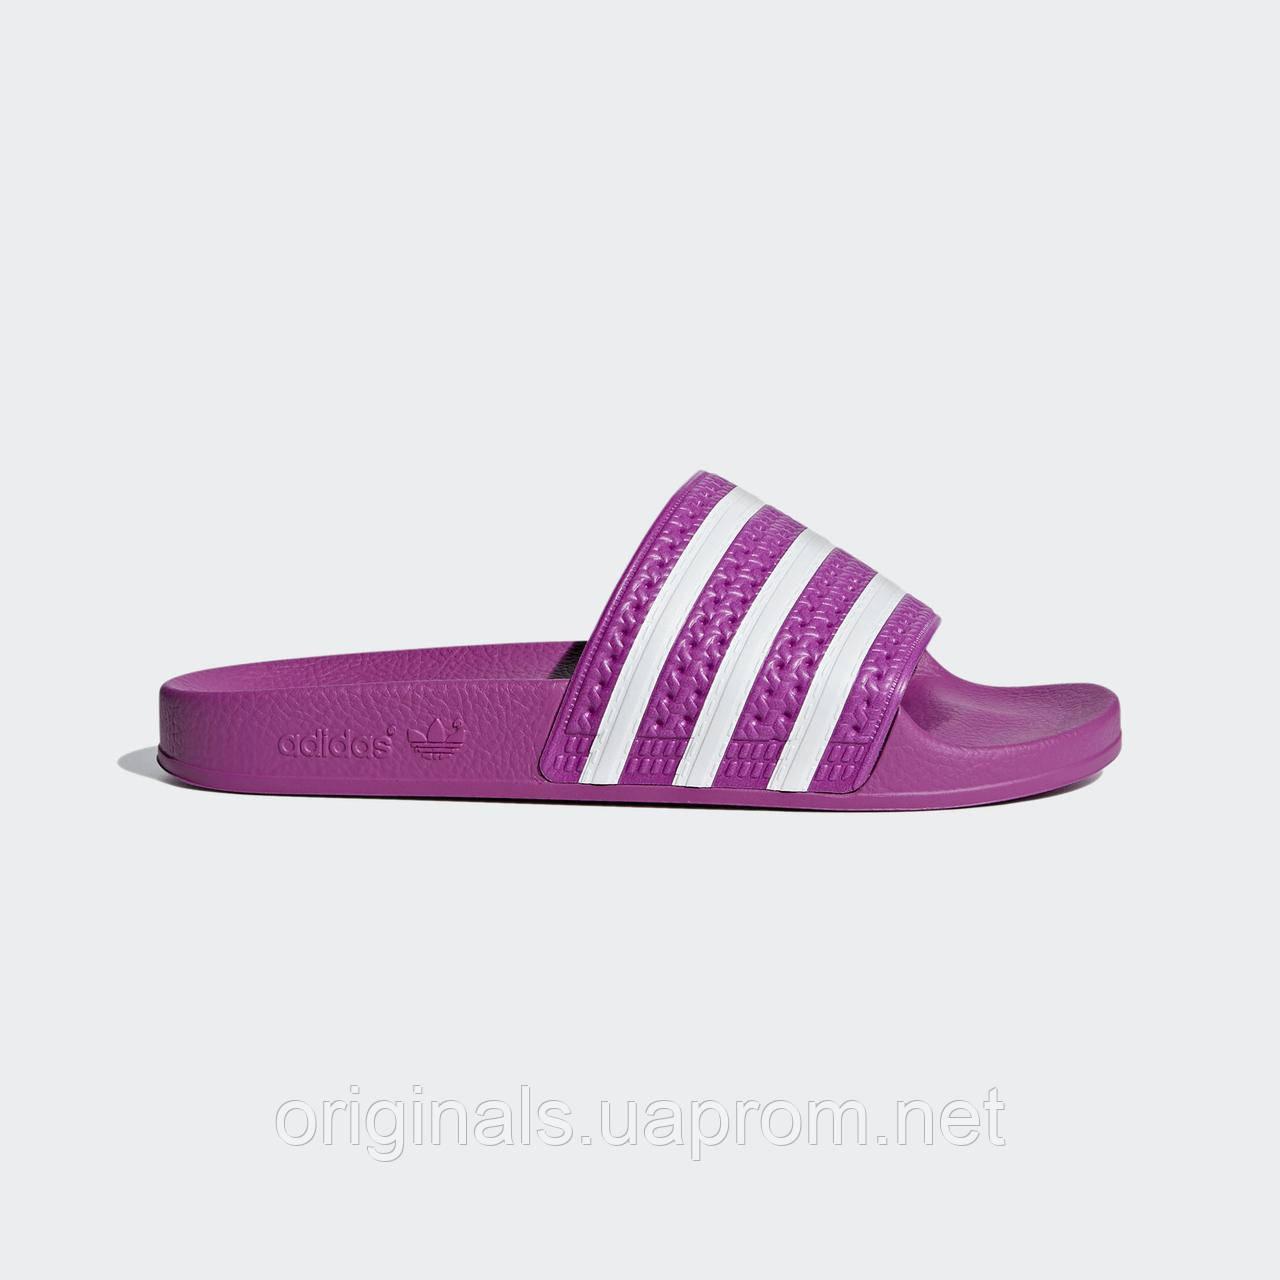 Женские шлепанцы Adidas Adilette W CG6539